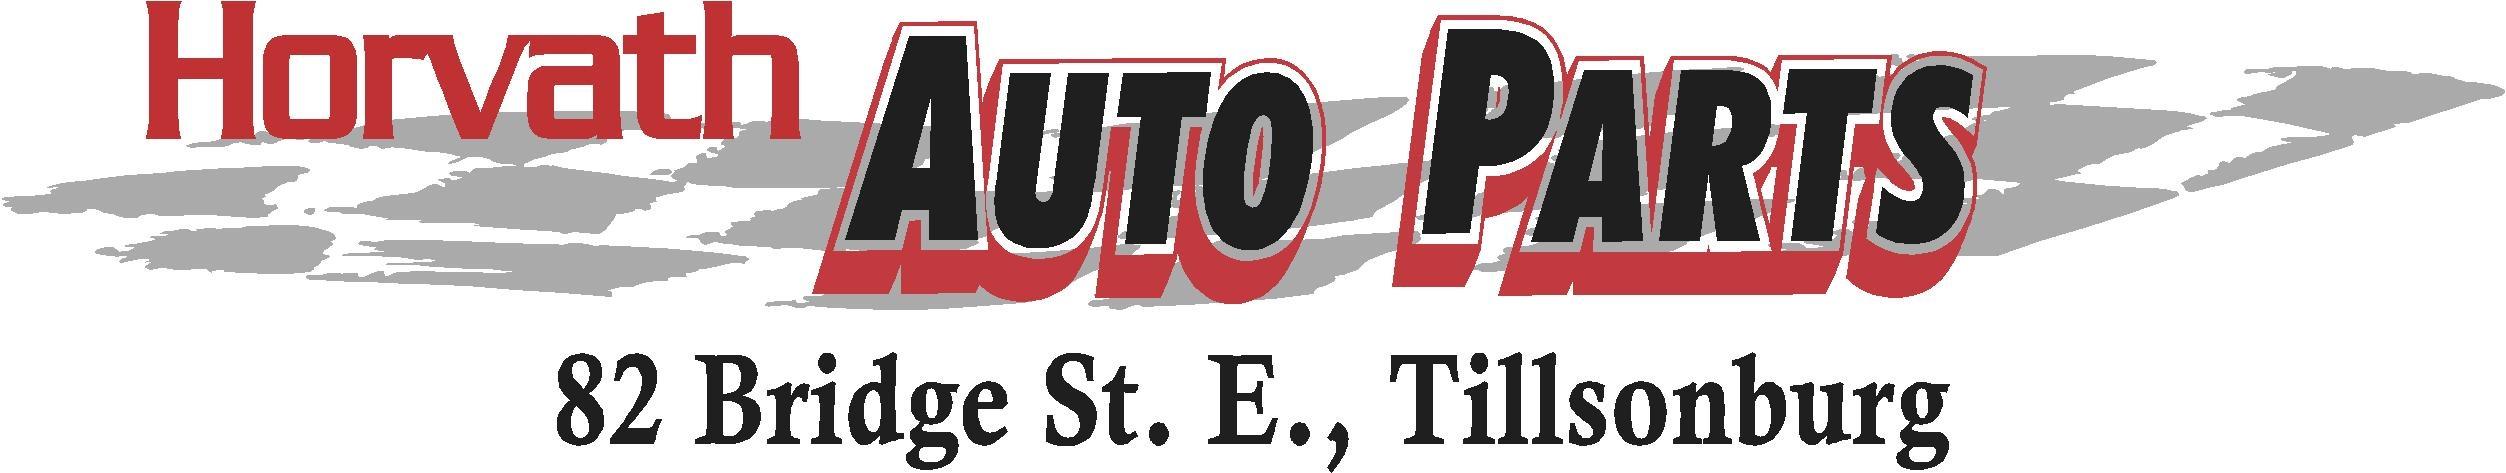 horvath-auto-parts-logo-1.jpg